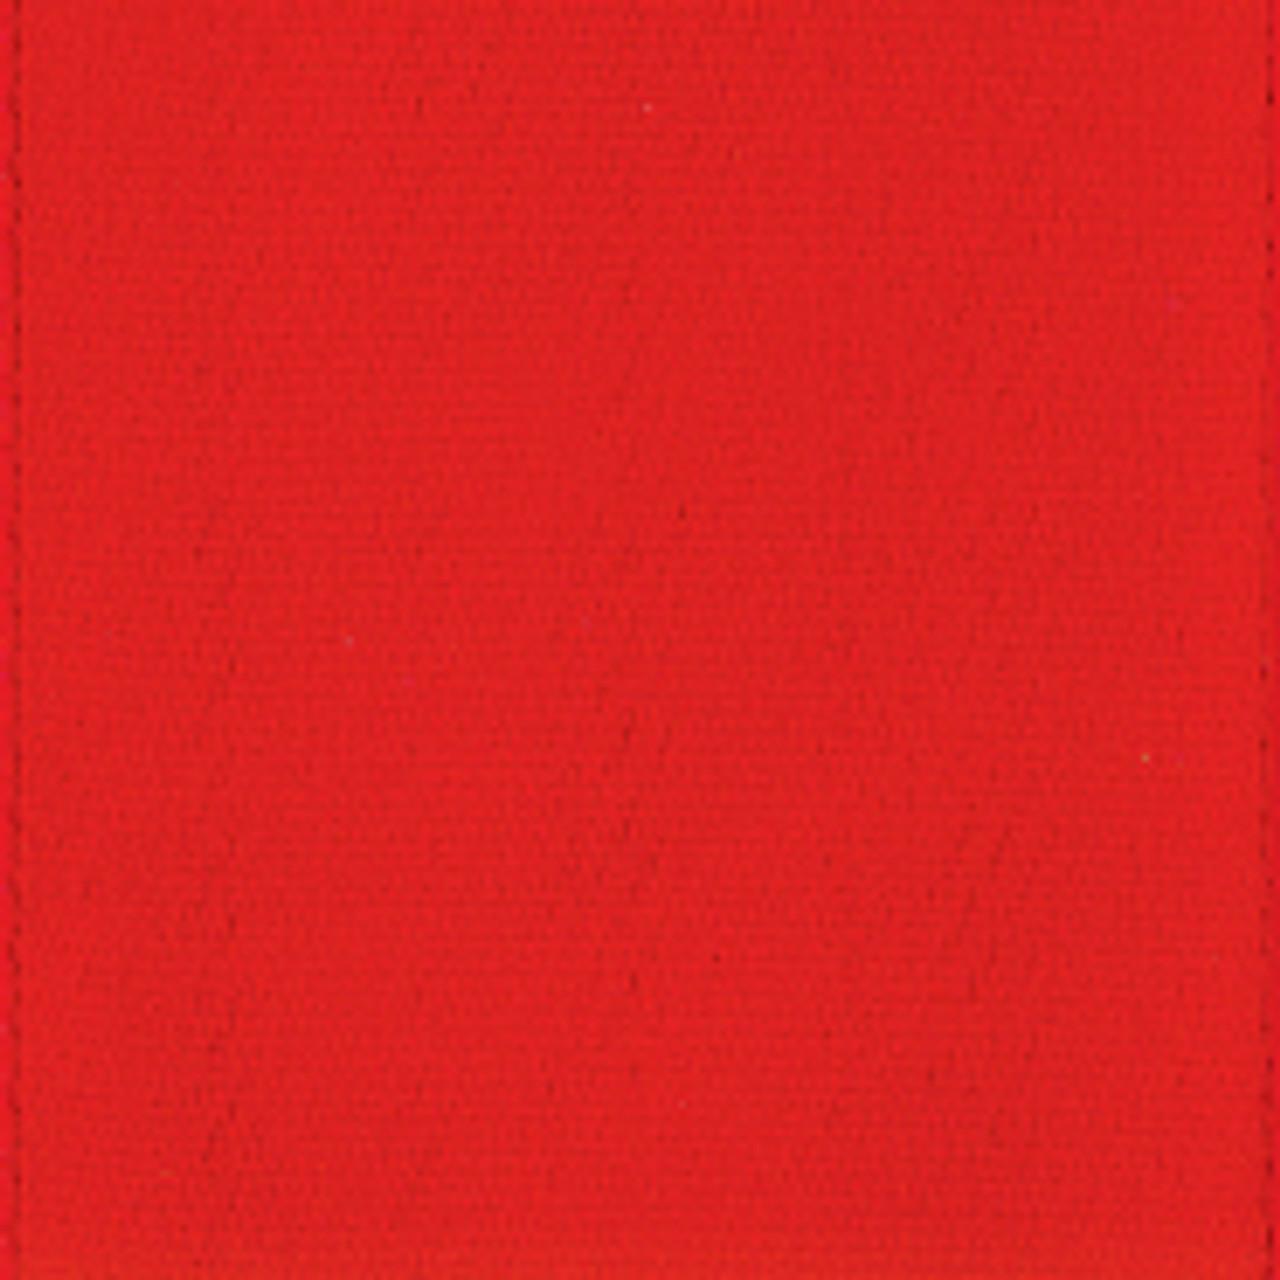 Hot Red Single Faced Satin Ribbon